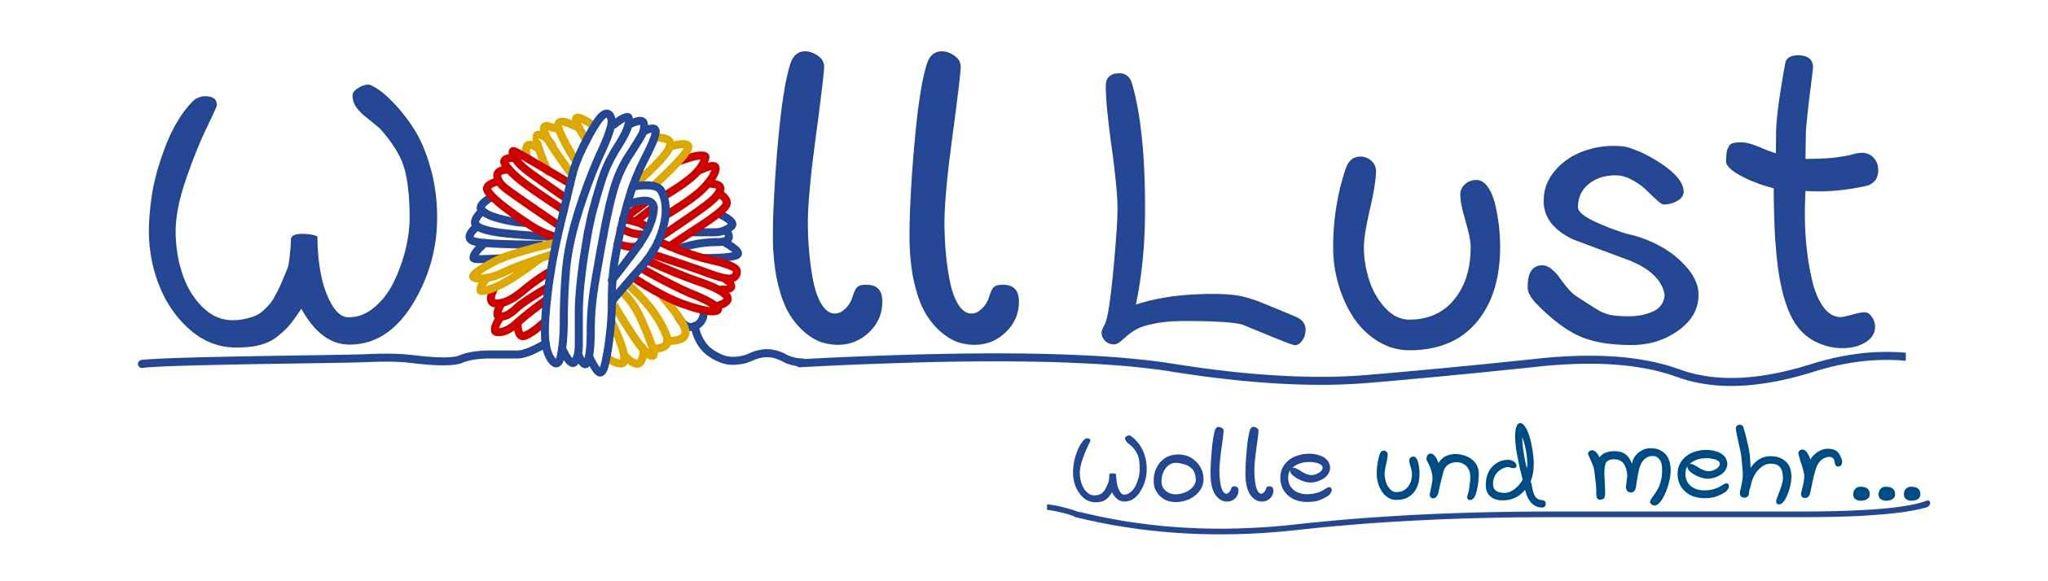 Wollust-krefeld.de